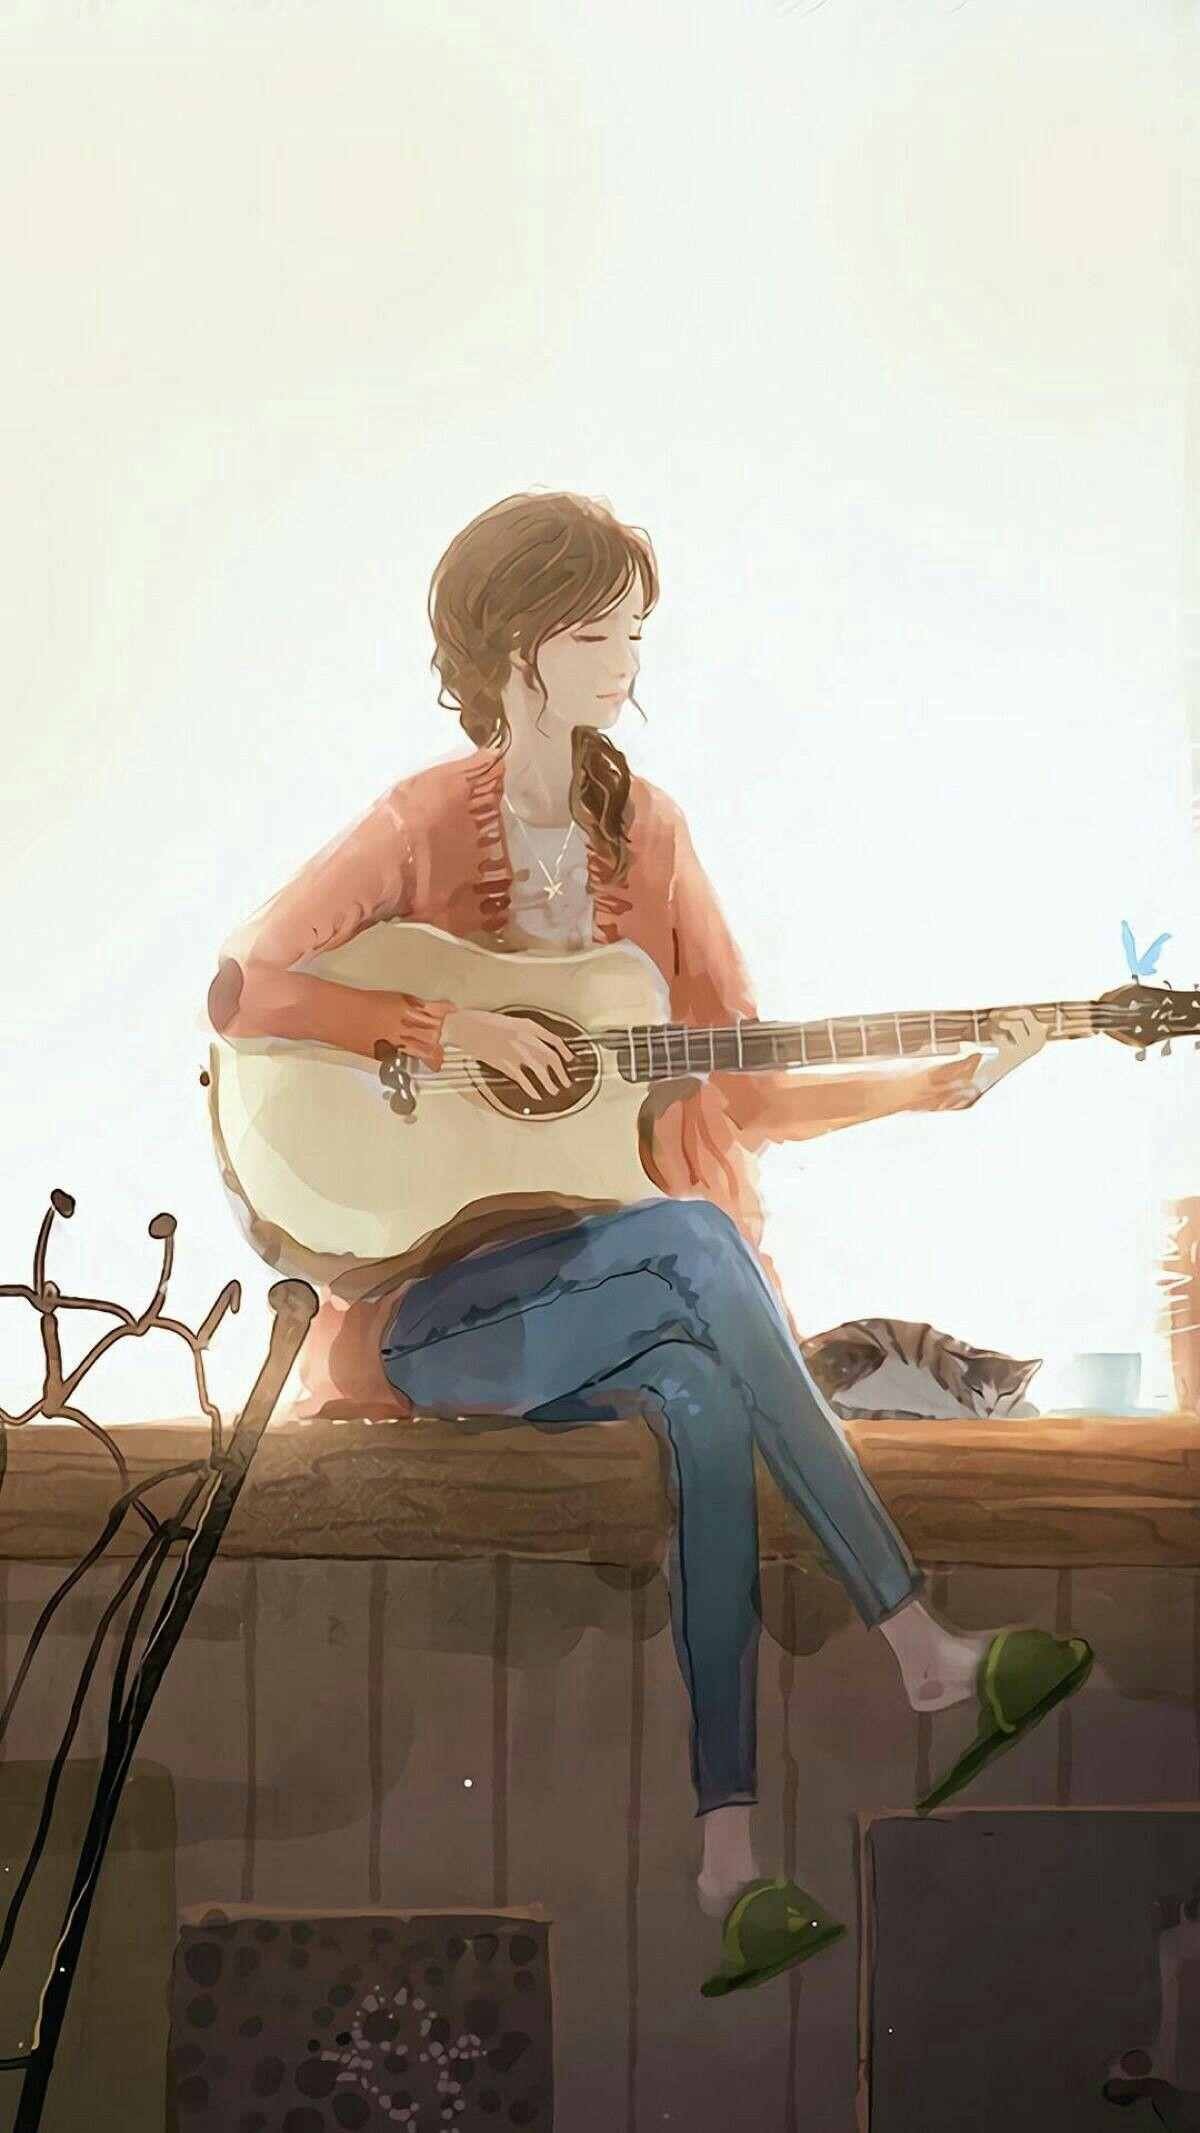 Pin Oleh Lia Delicia Di Anime Art Ilustrasi Ilustrasi Fantasi Gambar